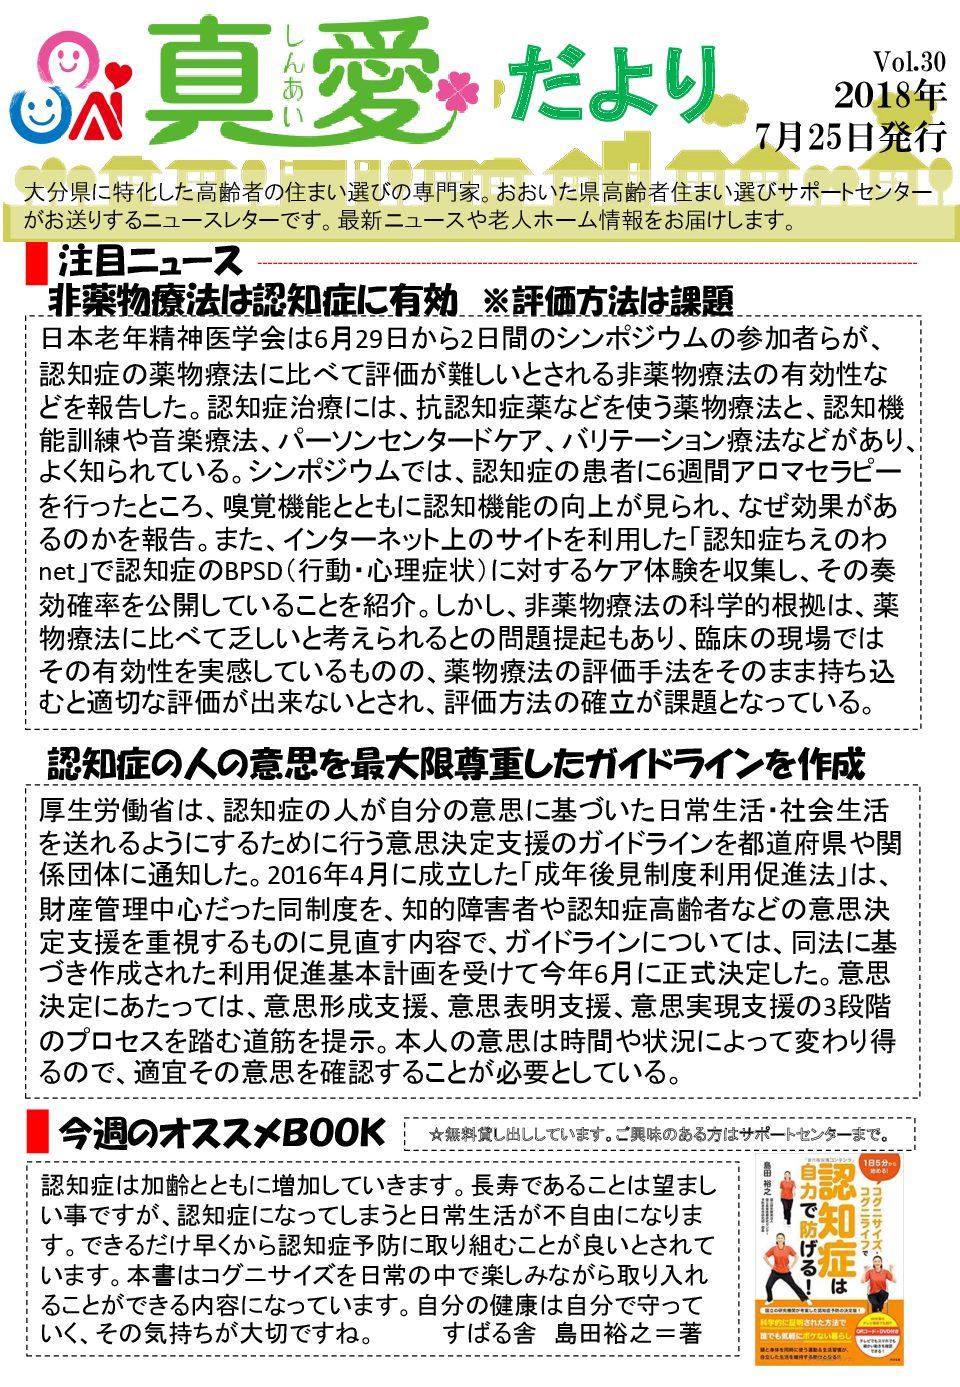 【Vol.30】 2018.07.25発行